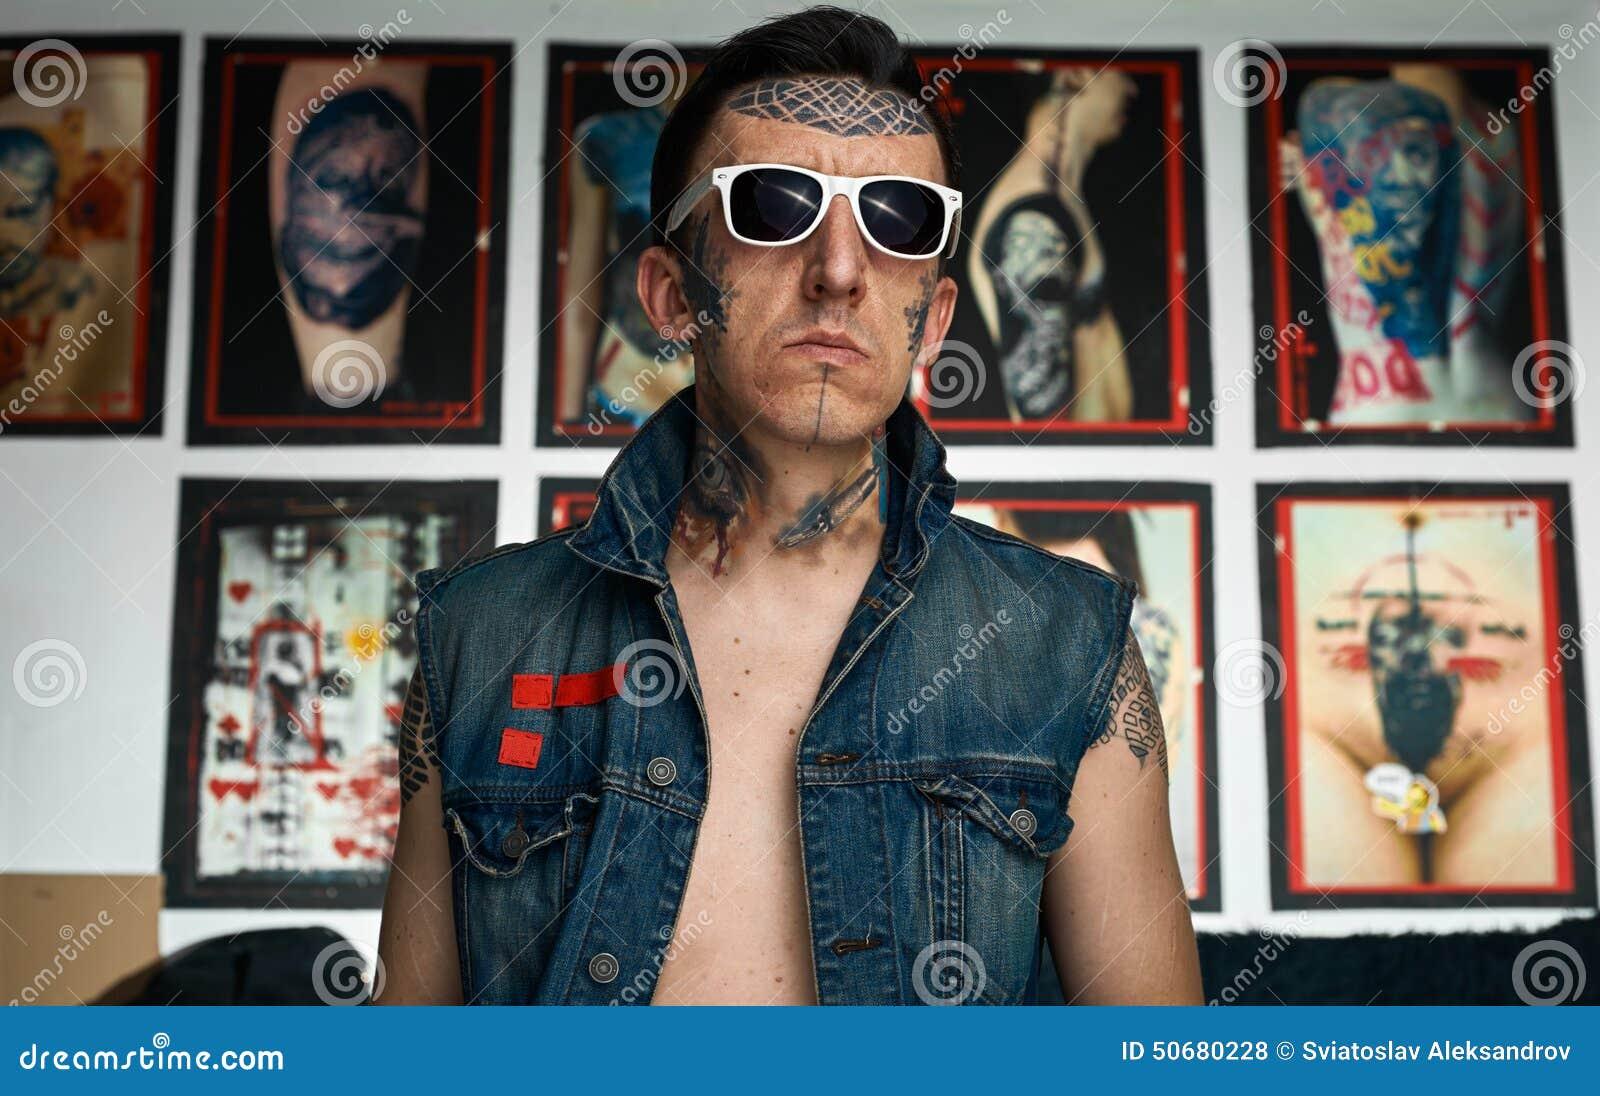 Download 牛仔布背心和太阳镜的被刺字的人在演播室 库存照片. 图片 包括有 夹克, 投反对票, 工作室, 欧洲, 皮肤 - 50680228